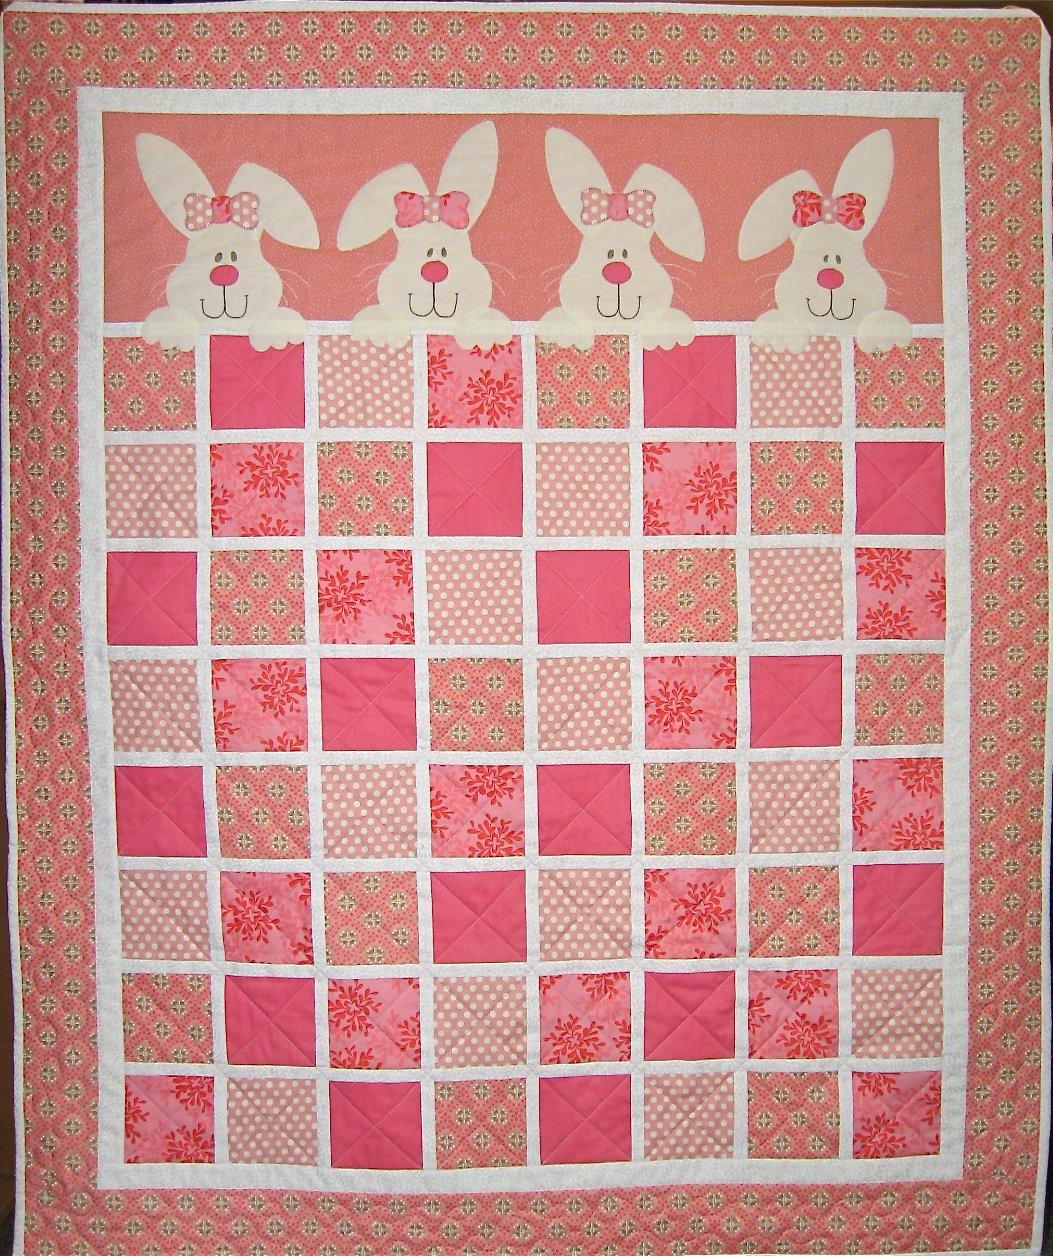 Bunnies - Bunny Hugs Quilt Kit, Pink version